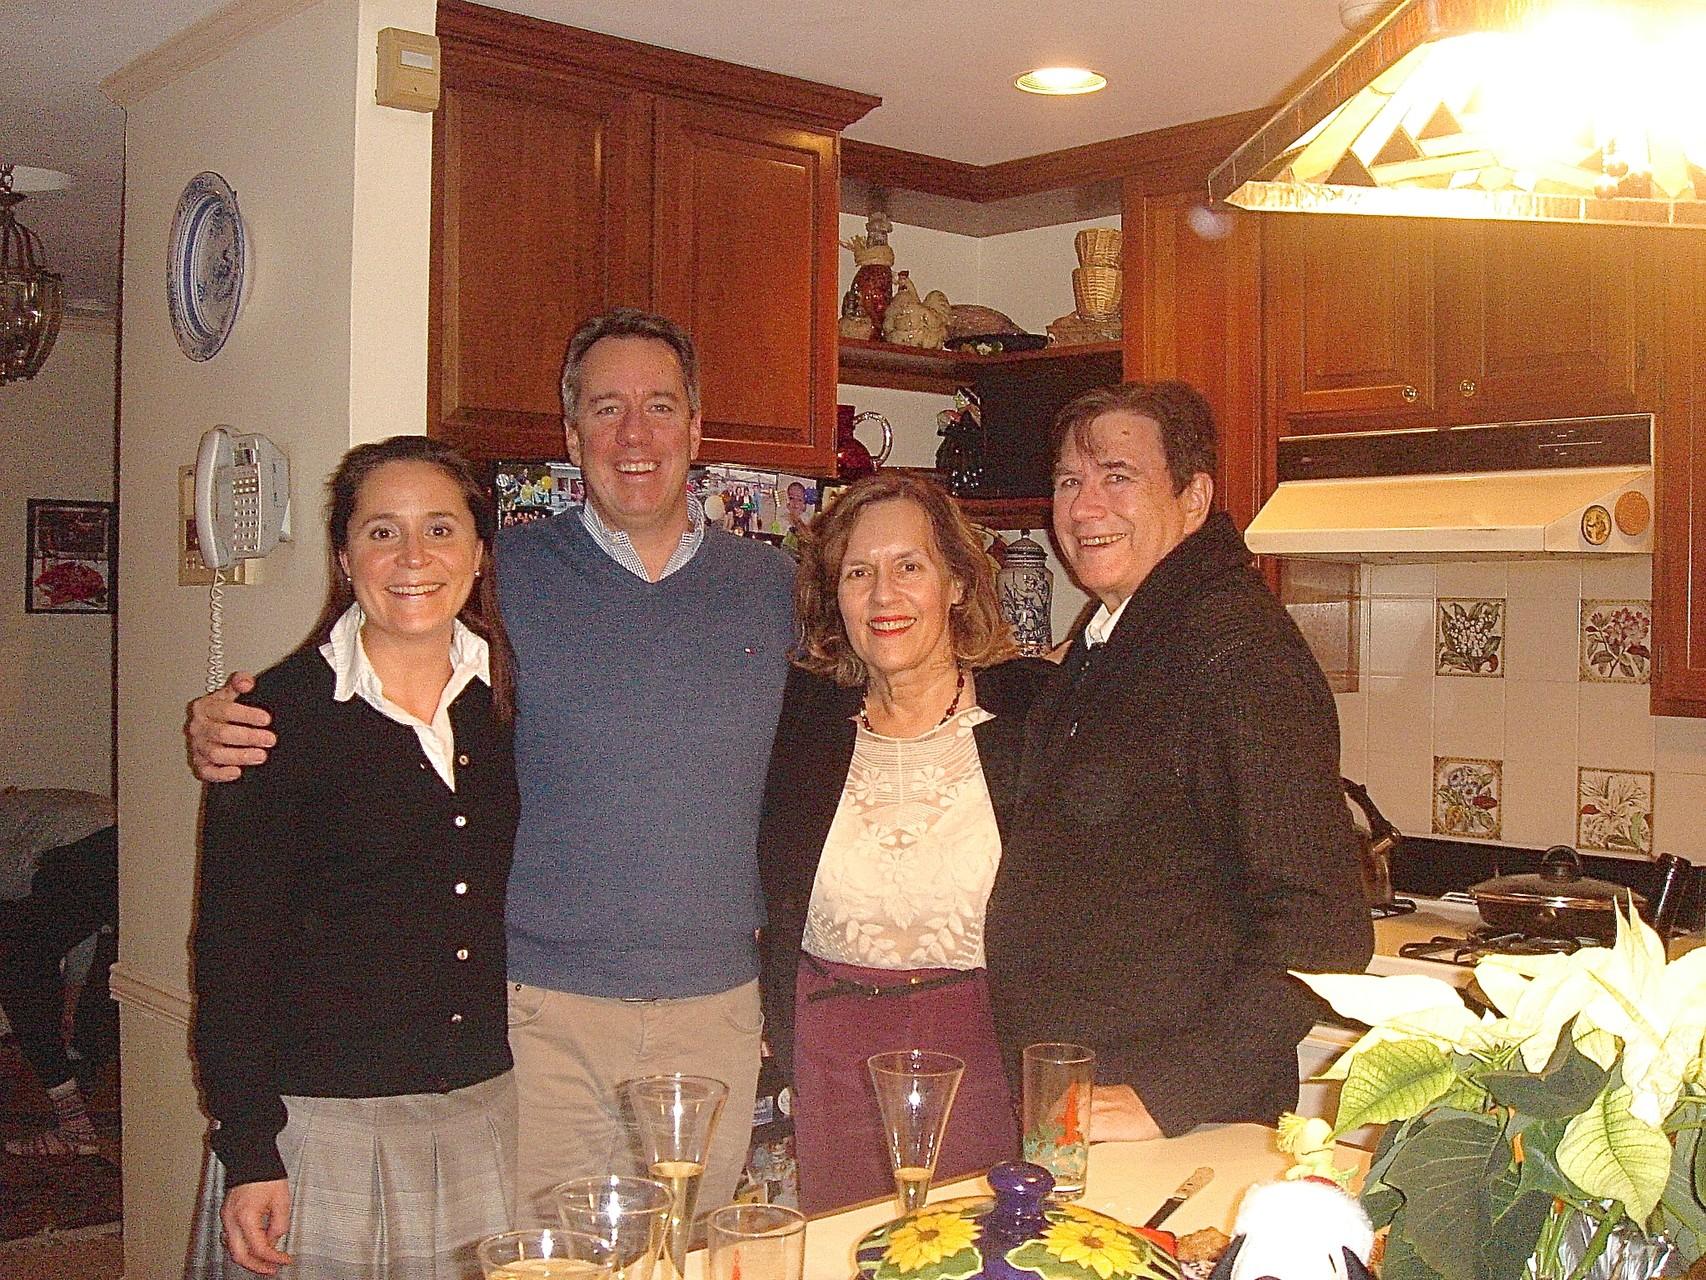 Barbara & Jon Boylan, Lorraine Gudas (Jon's cousin) & John Wagner